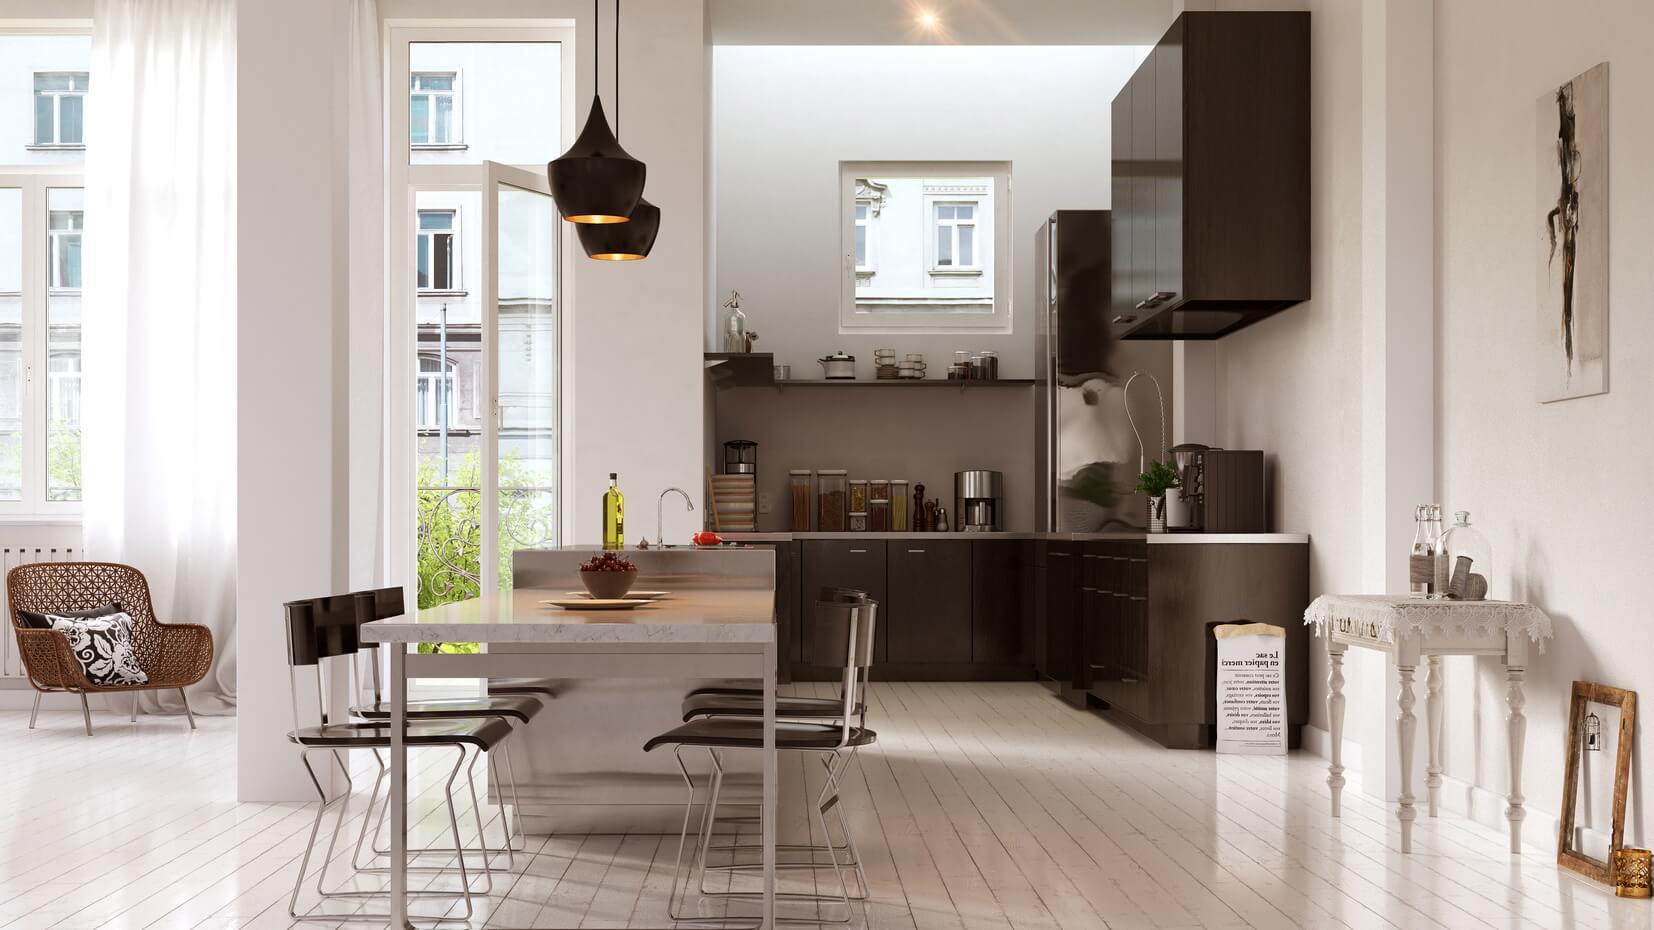 ikea schr nkt lebenslanges r ckgaberecht ein. Black Bedroom Furniture Sets. Home Design Ideas